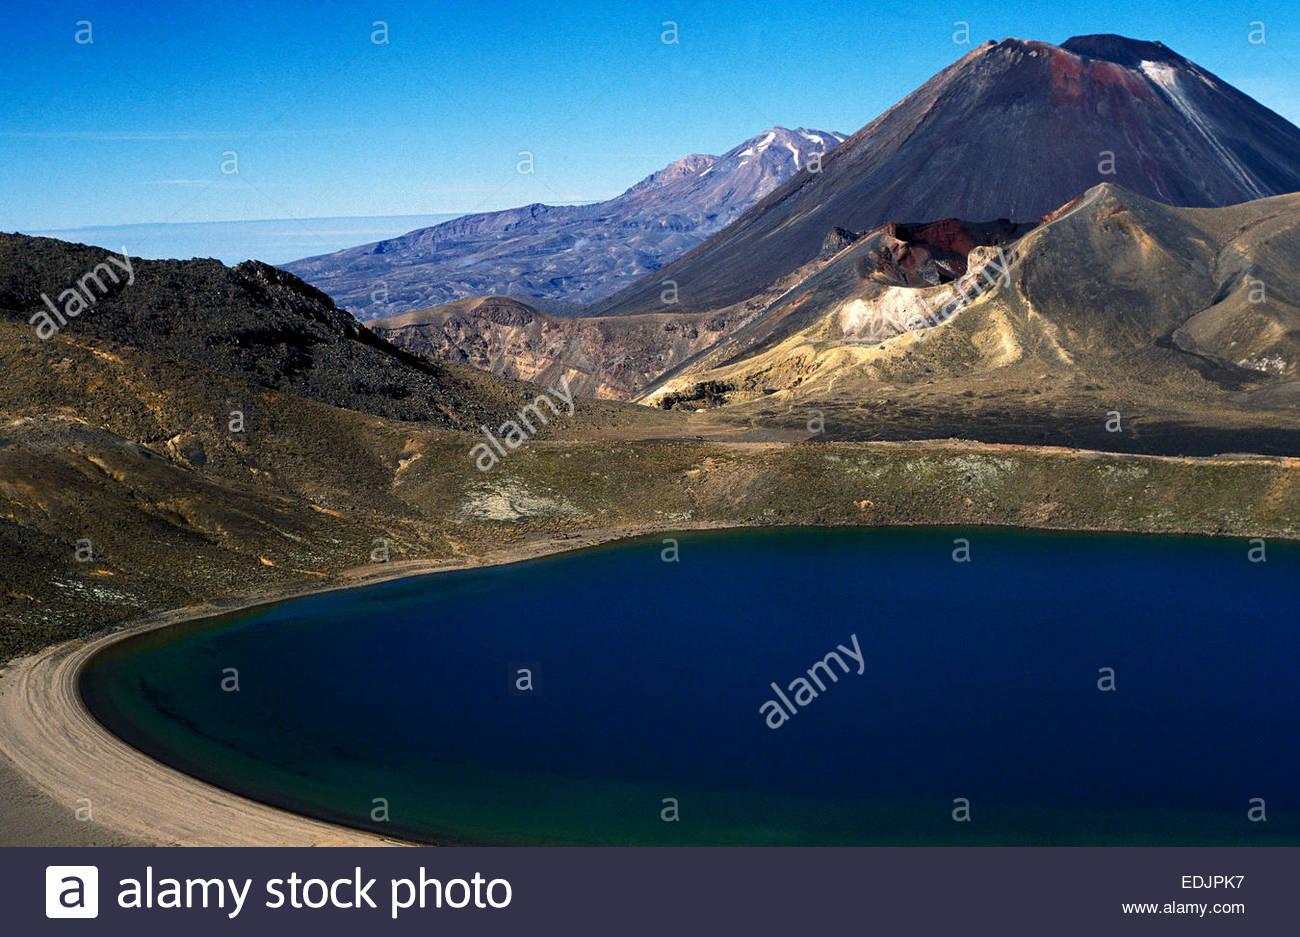 Ngauruhoe volcano and lake. Tongarori National Park, North island. - Stock Image